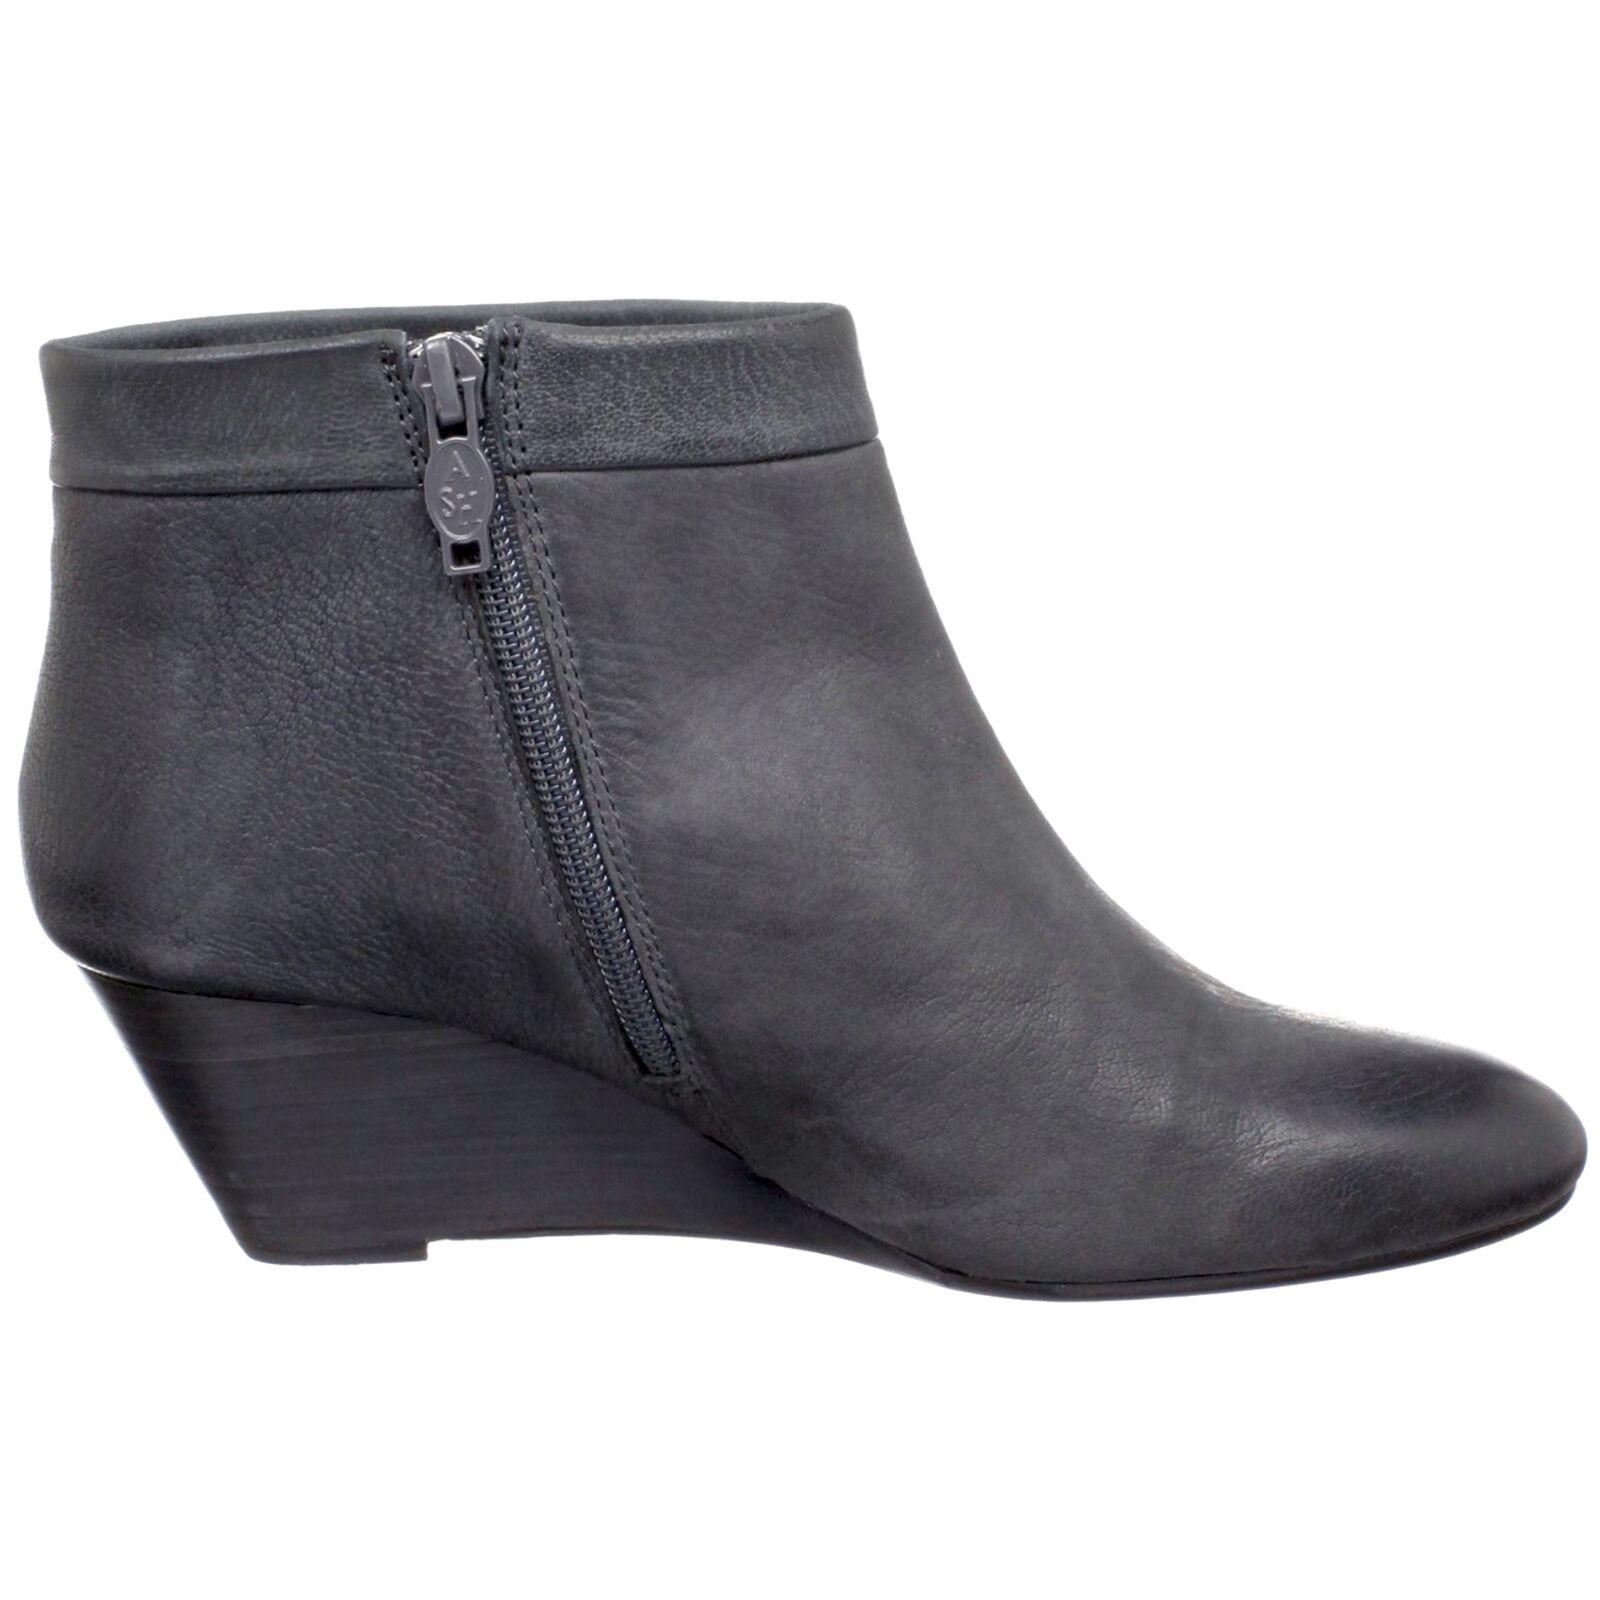 punti vendita NEW Ash Italia Donna Kristy Kristy Kristy Iron leather ankle wedge stivali Dimensione 38 M  265  molte sorprese